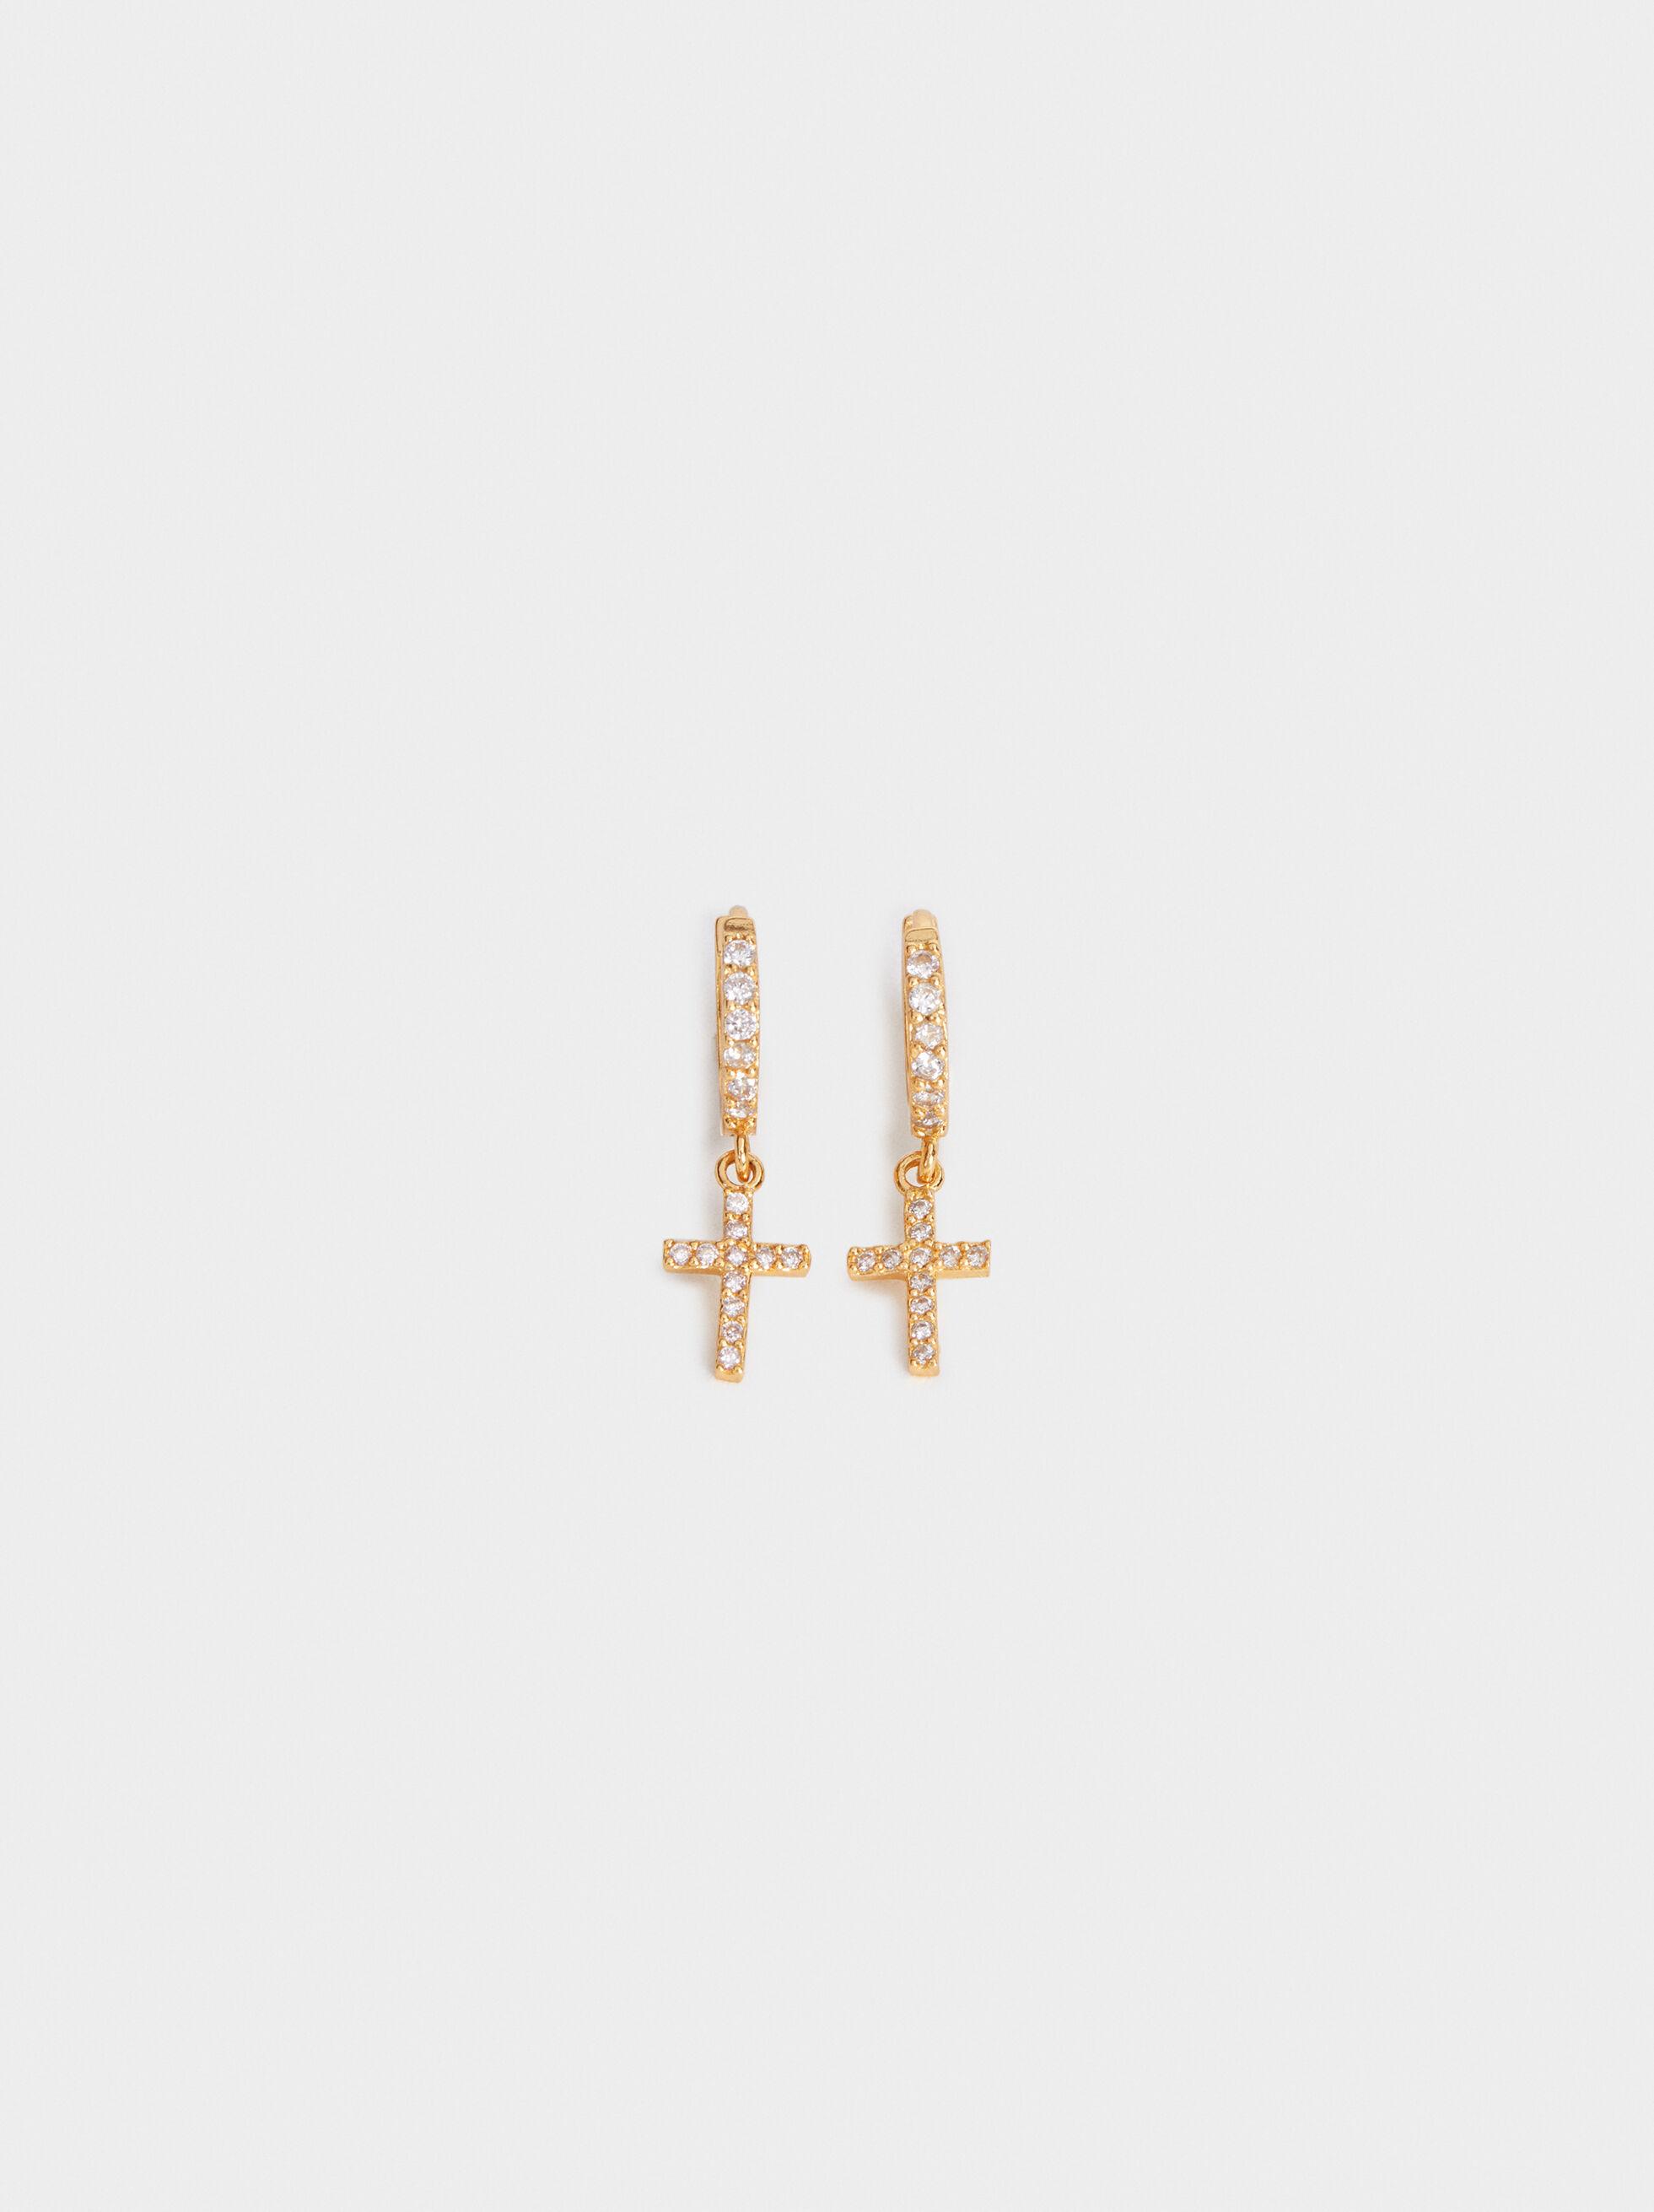 Small 925 Silver Hoop Earrings With Cross, , hi-res